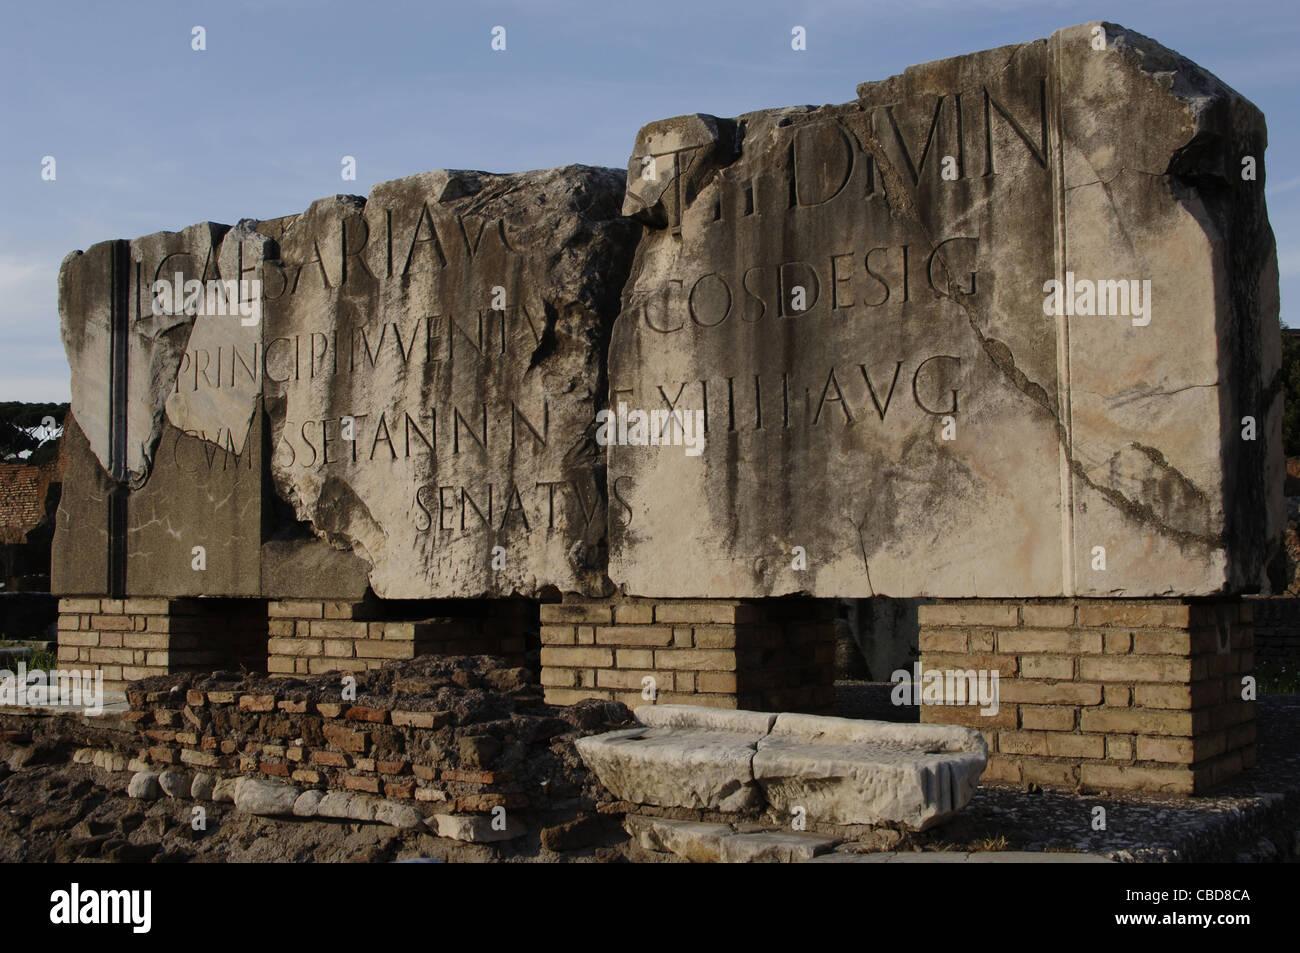 Inscription in a stone. Roman Forum. Rome. Italy. - Stock Image